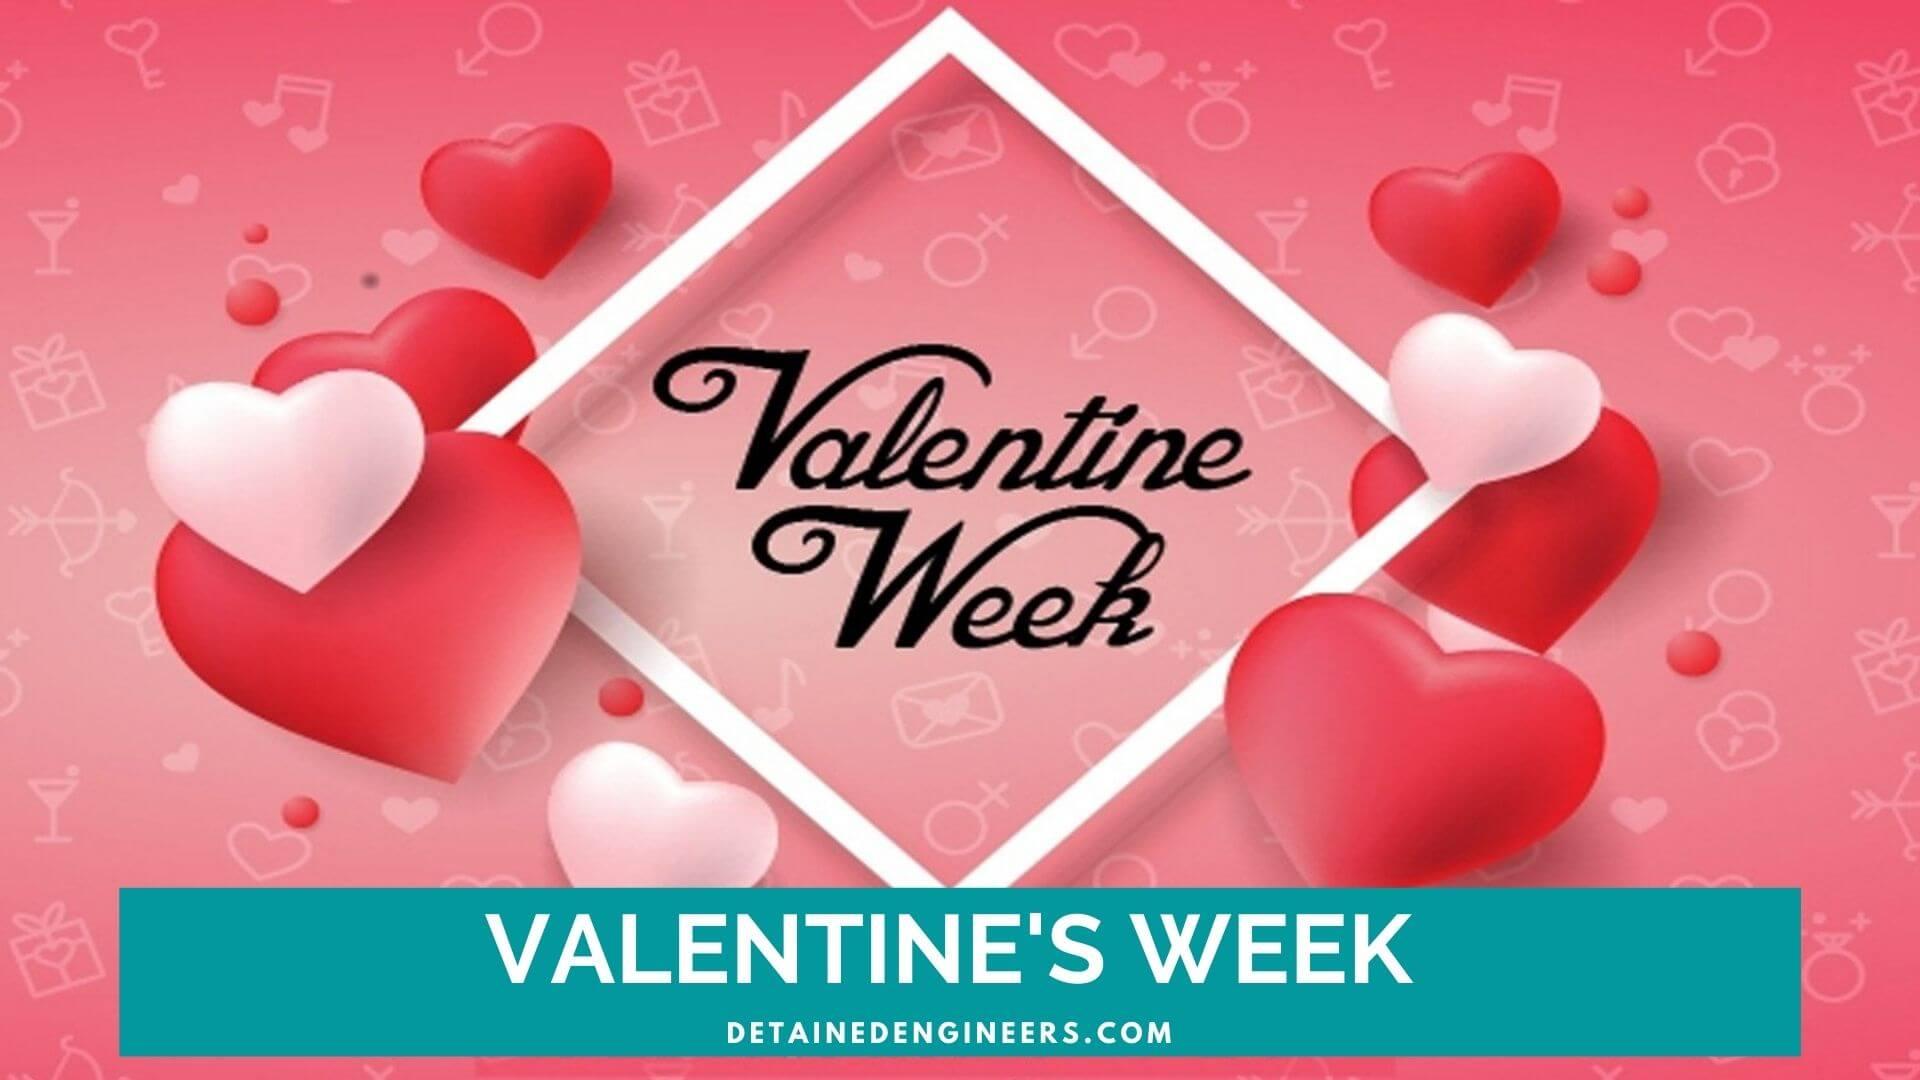 valentine's week celebrated